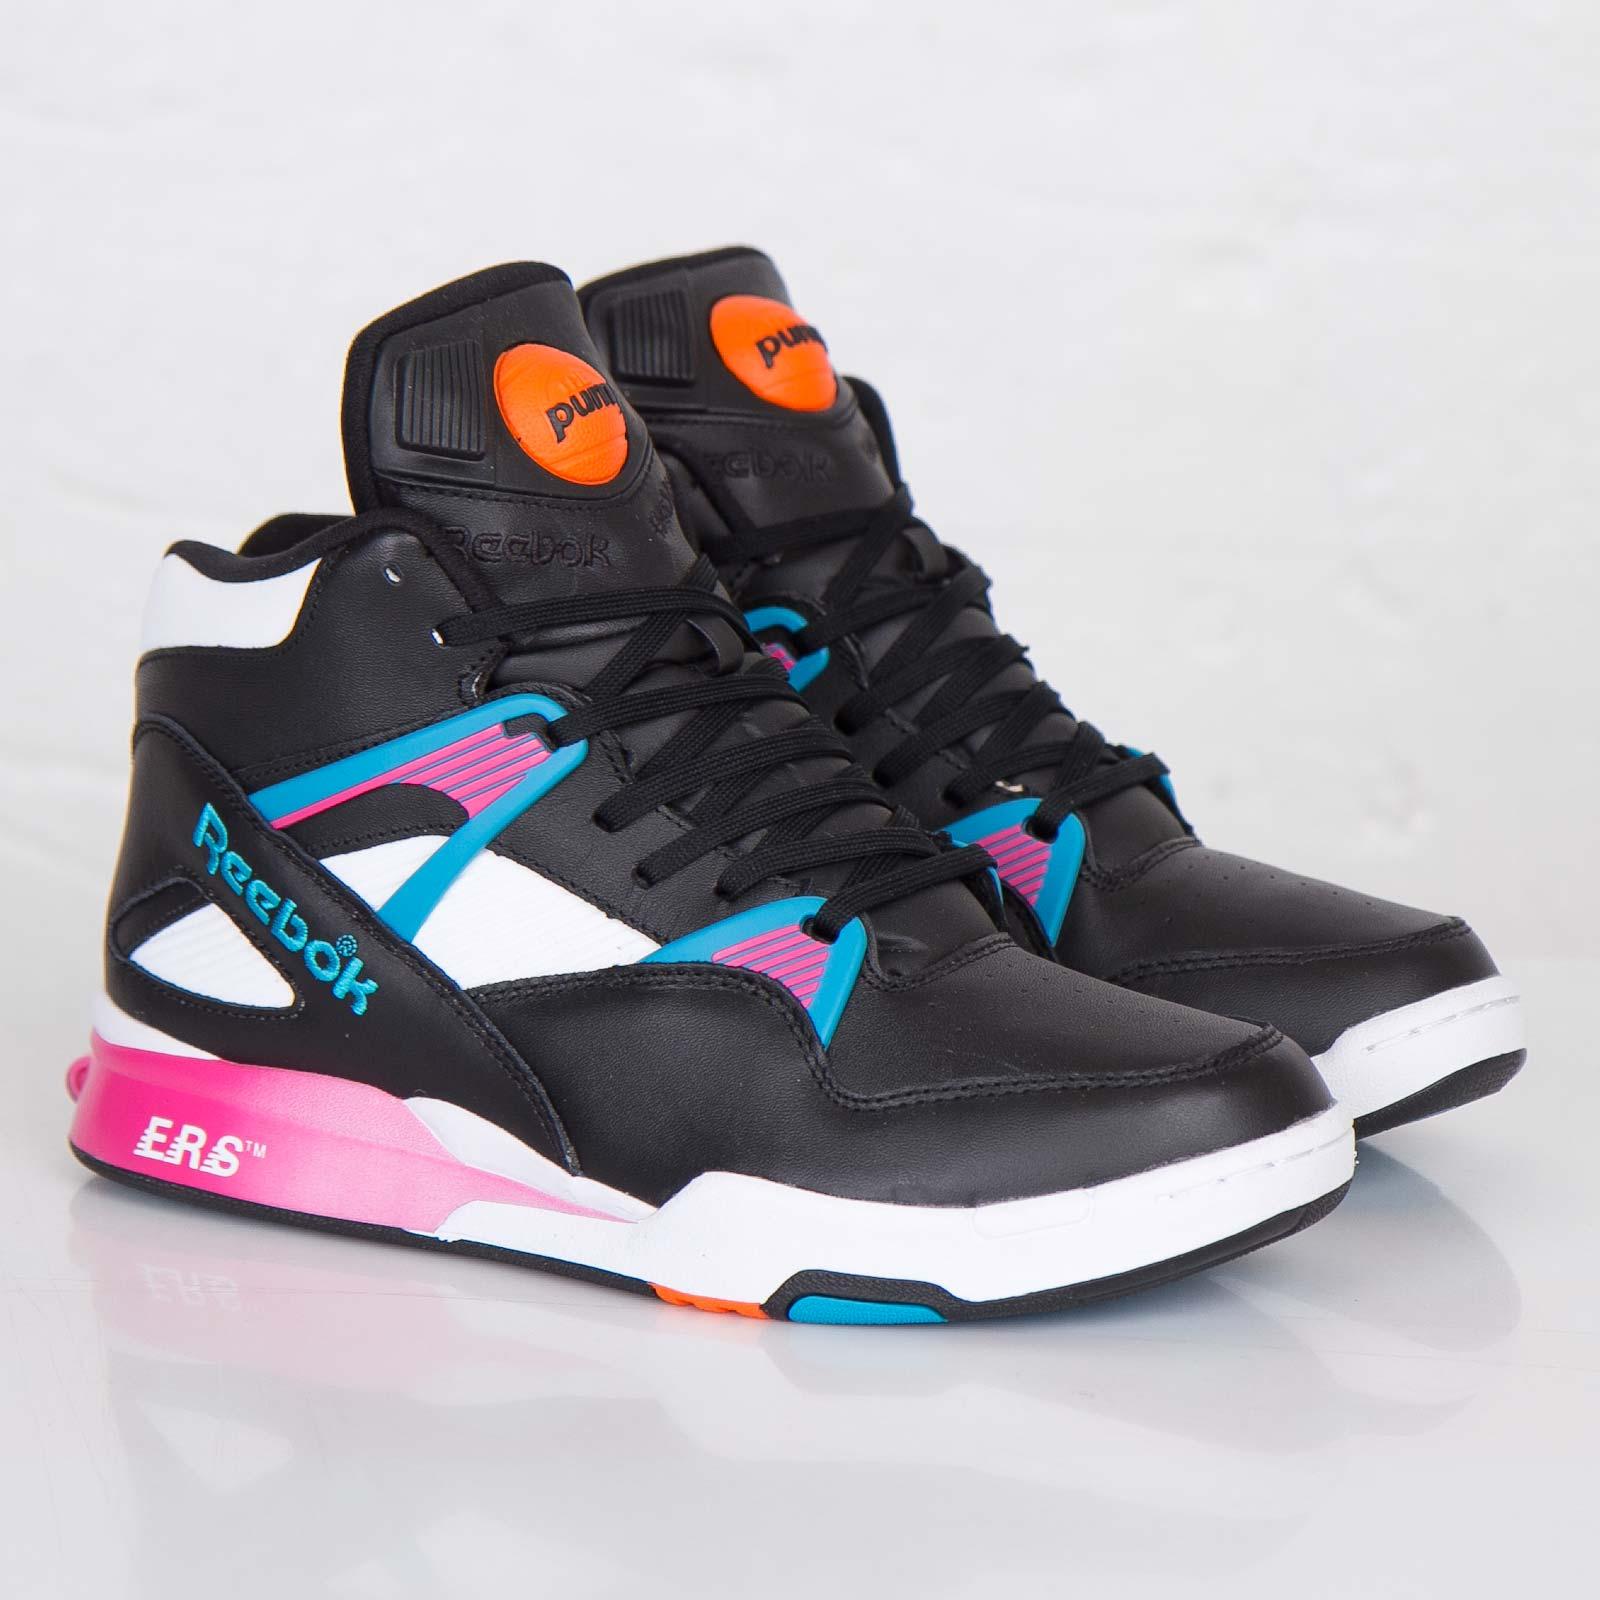 Reebok Pump Omni Zone Retro - V60498 - Sneakersnstuff  6a5814eed